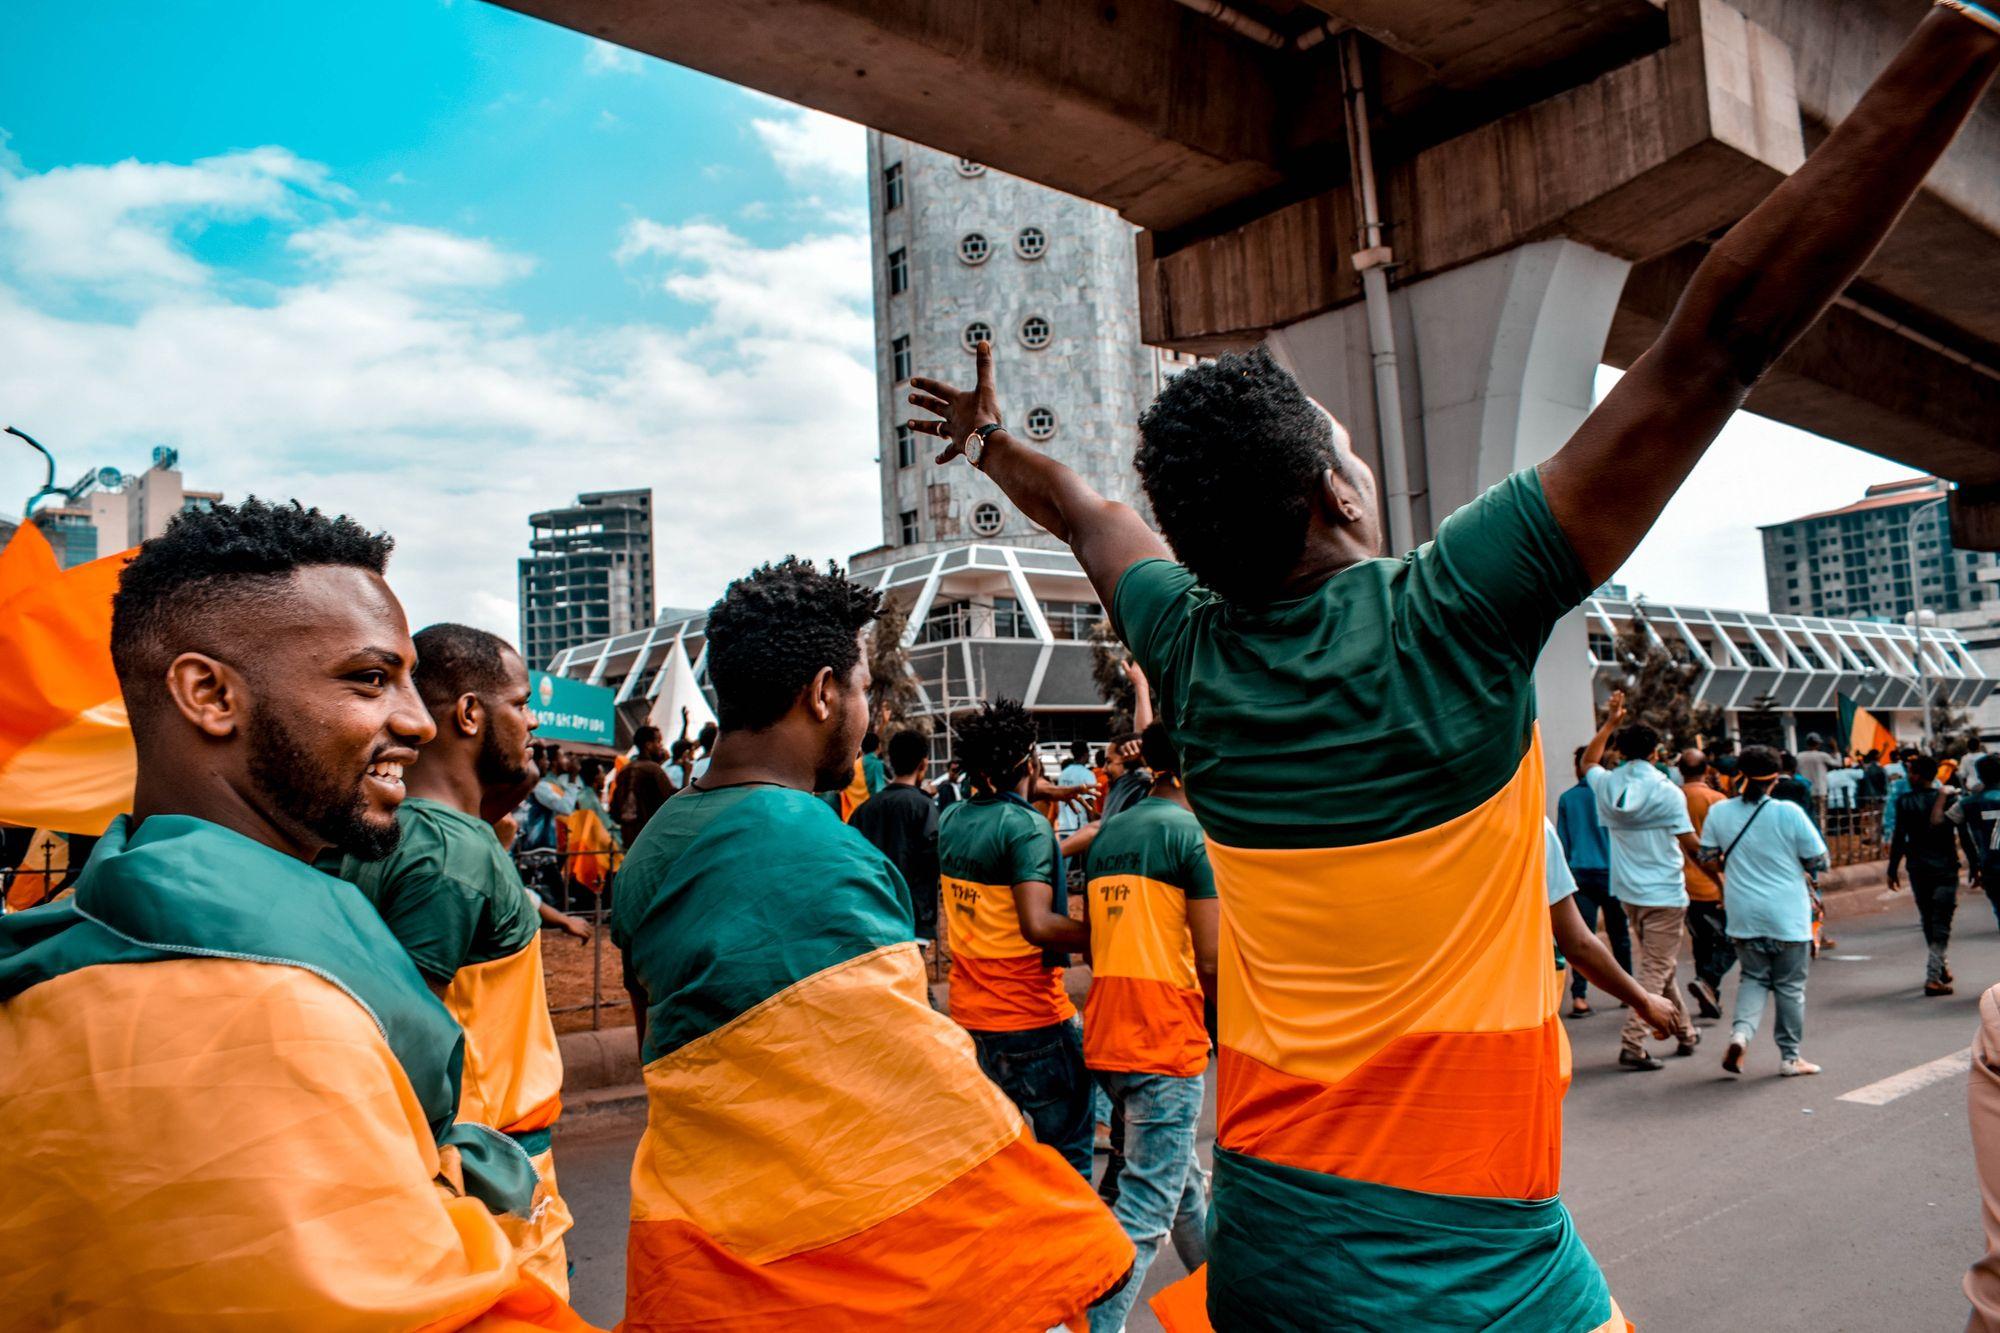 Has Ethiopia's Digital Finance Moment Finally Come?